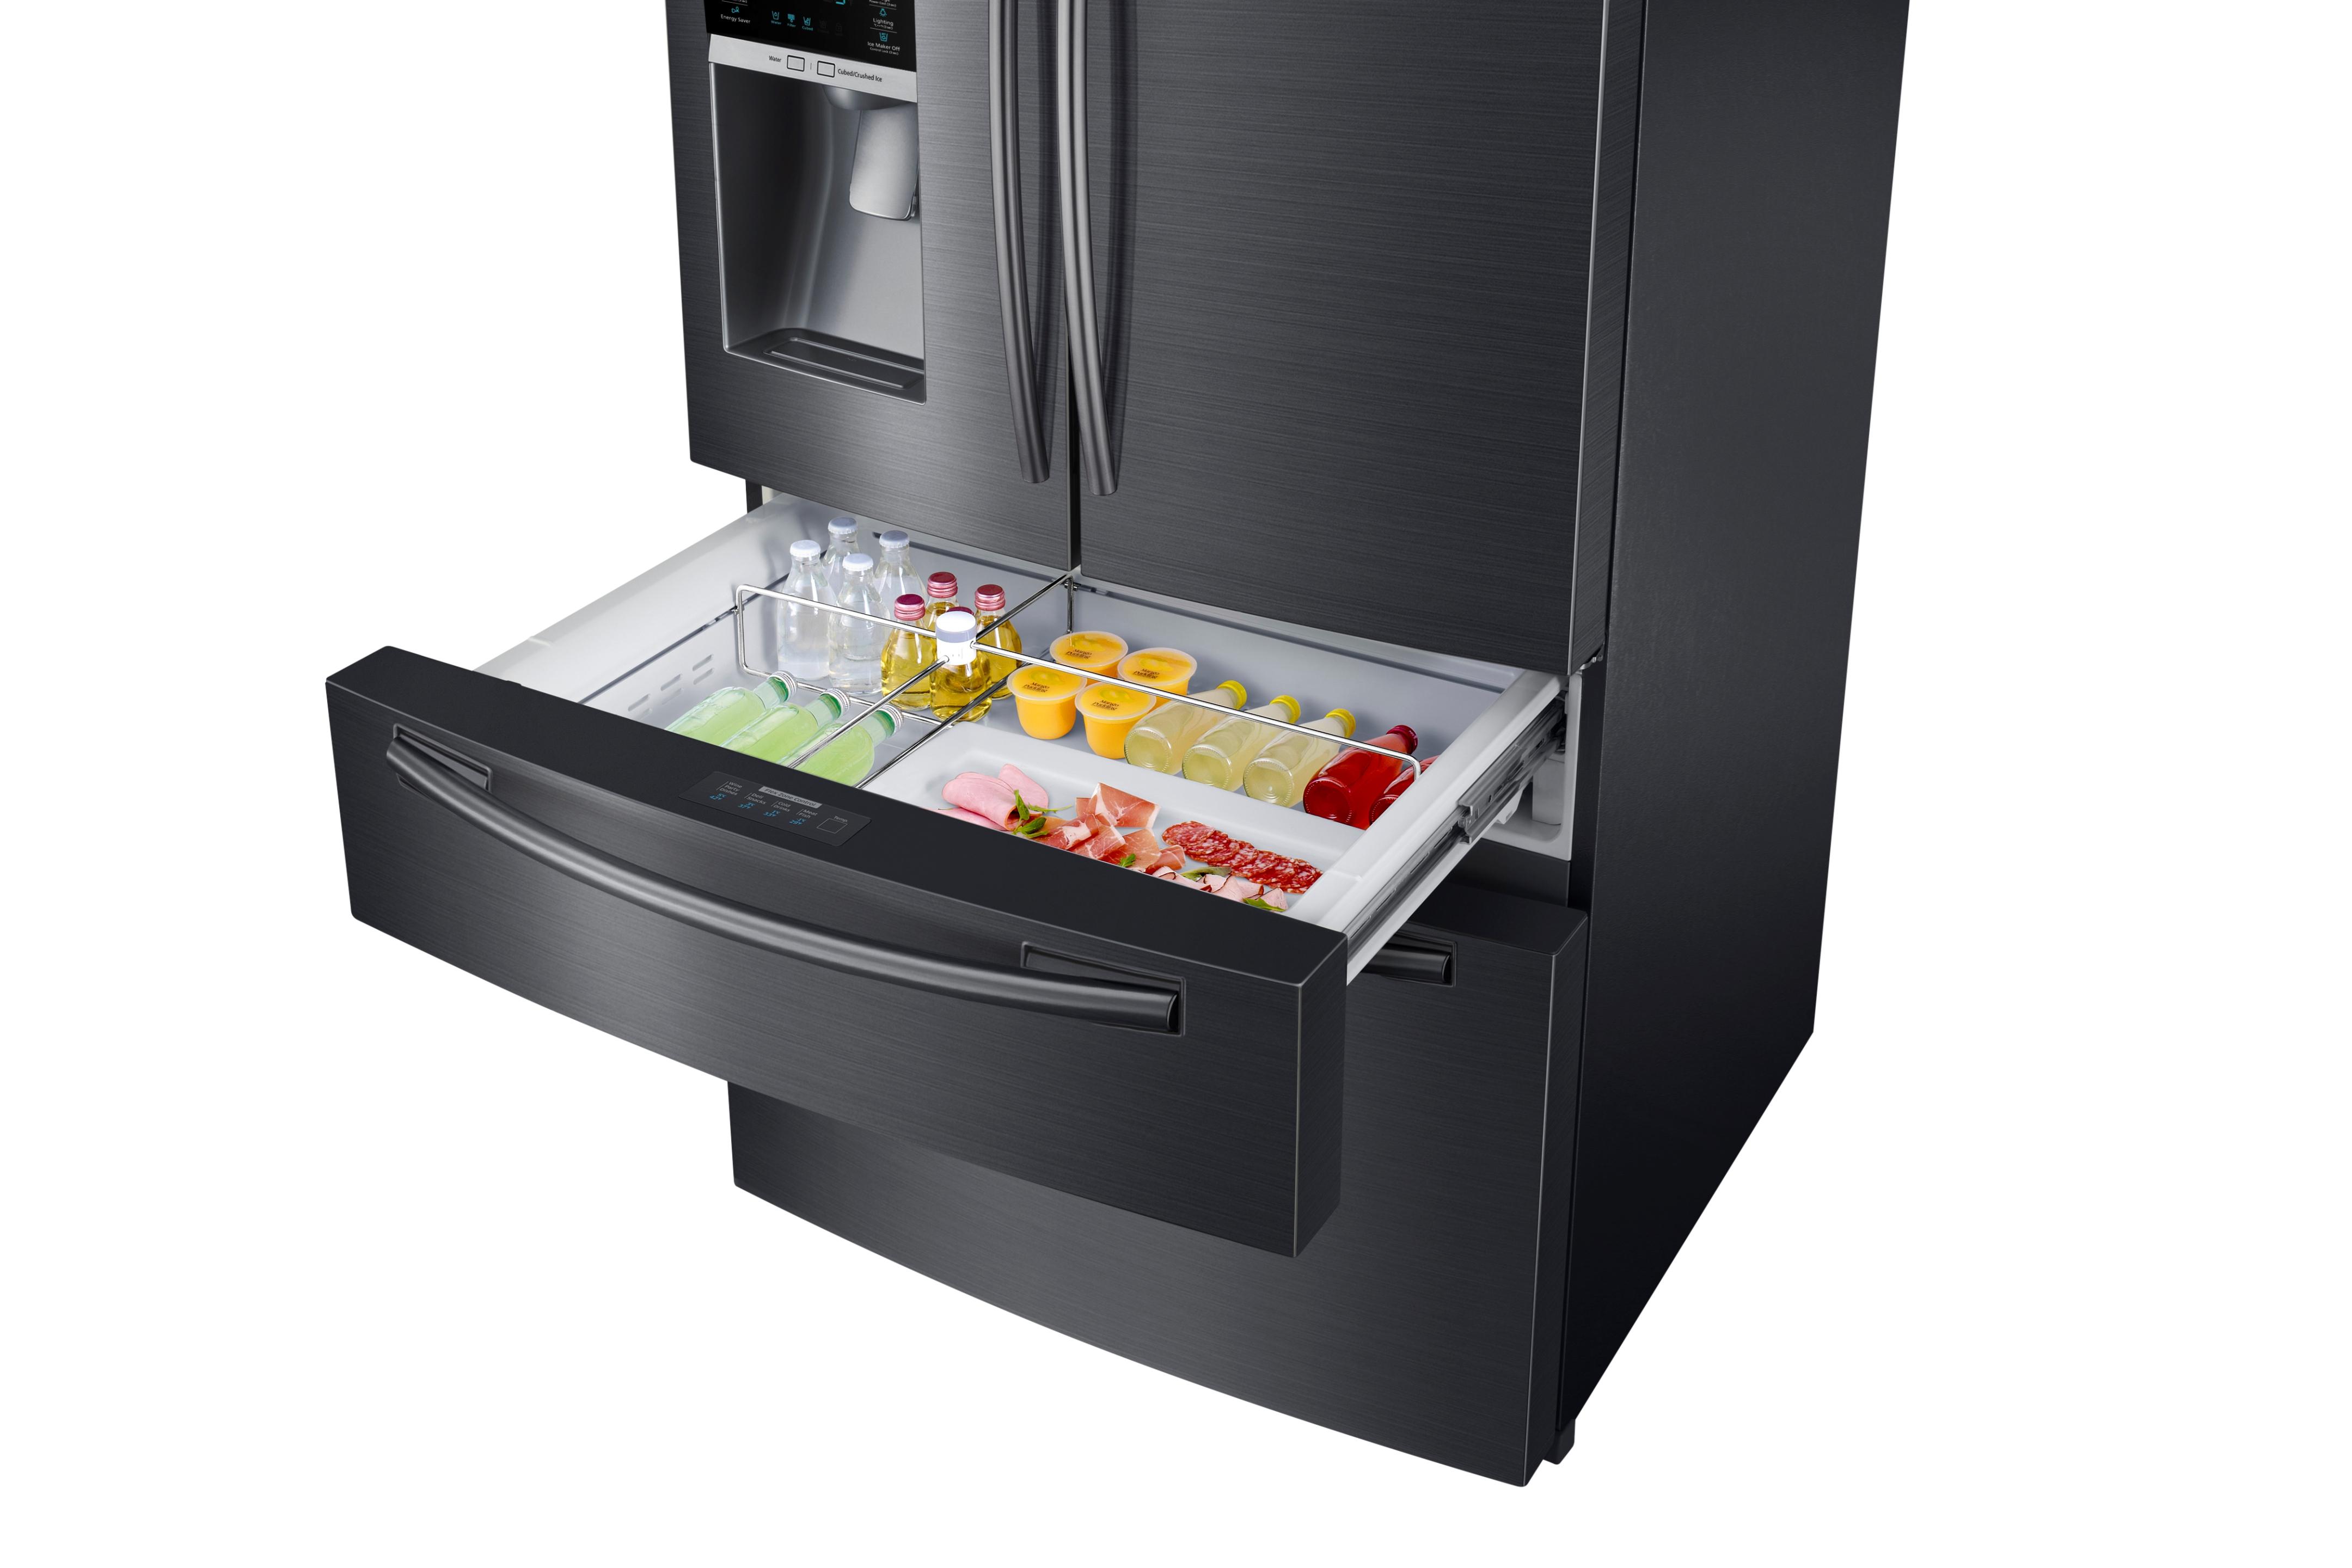 Samsung RF25HMEDBSG/AA 24.7 cu. ft. Capacity 4-Door French Door Refrigerator Black Stainless Steel